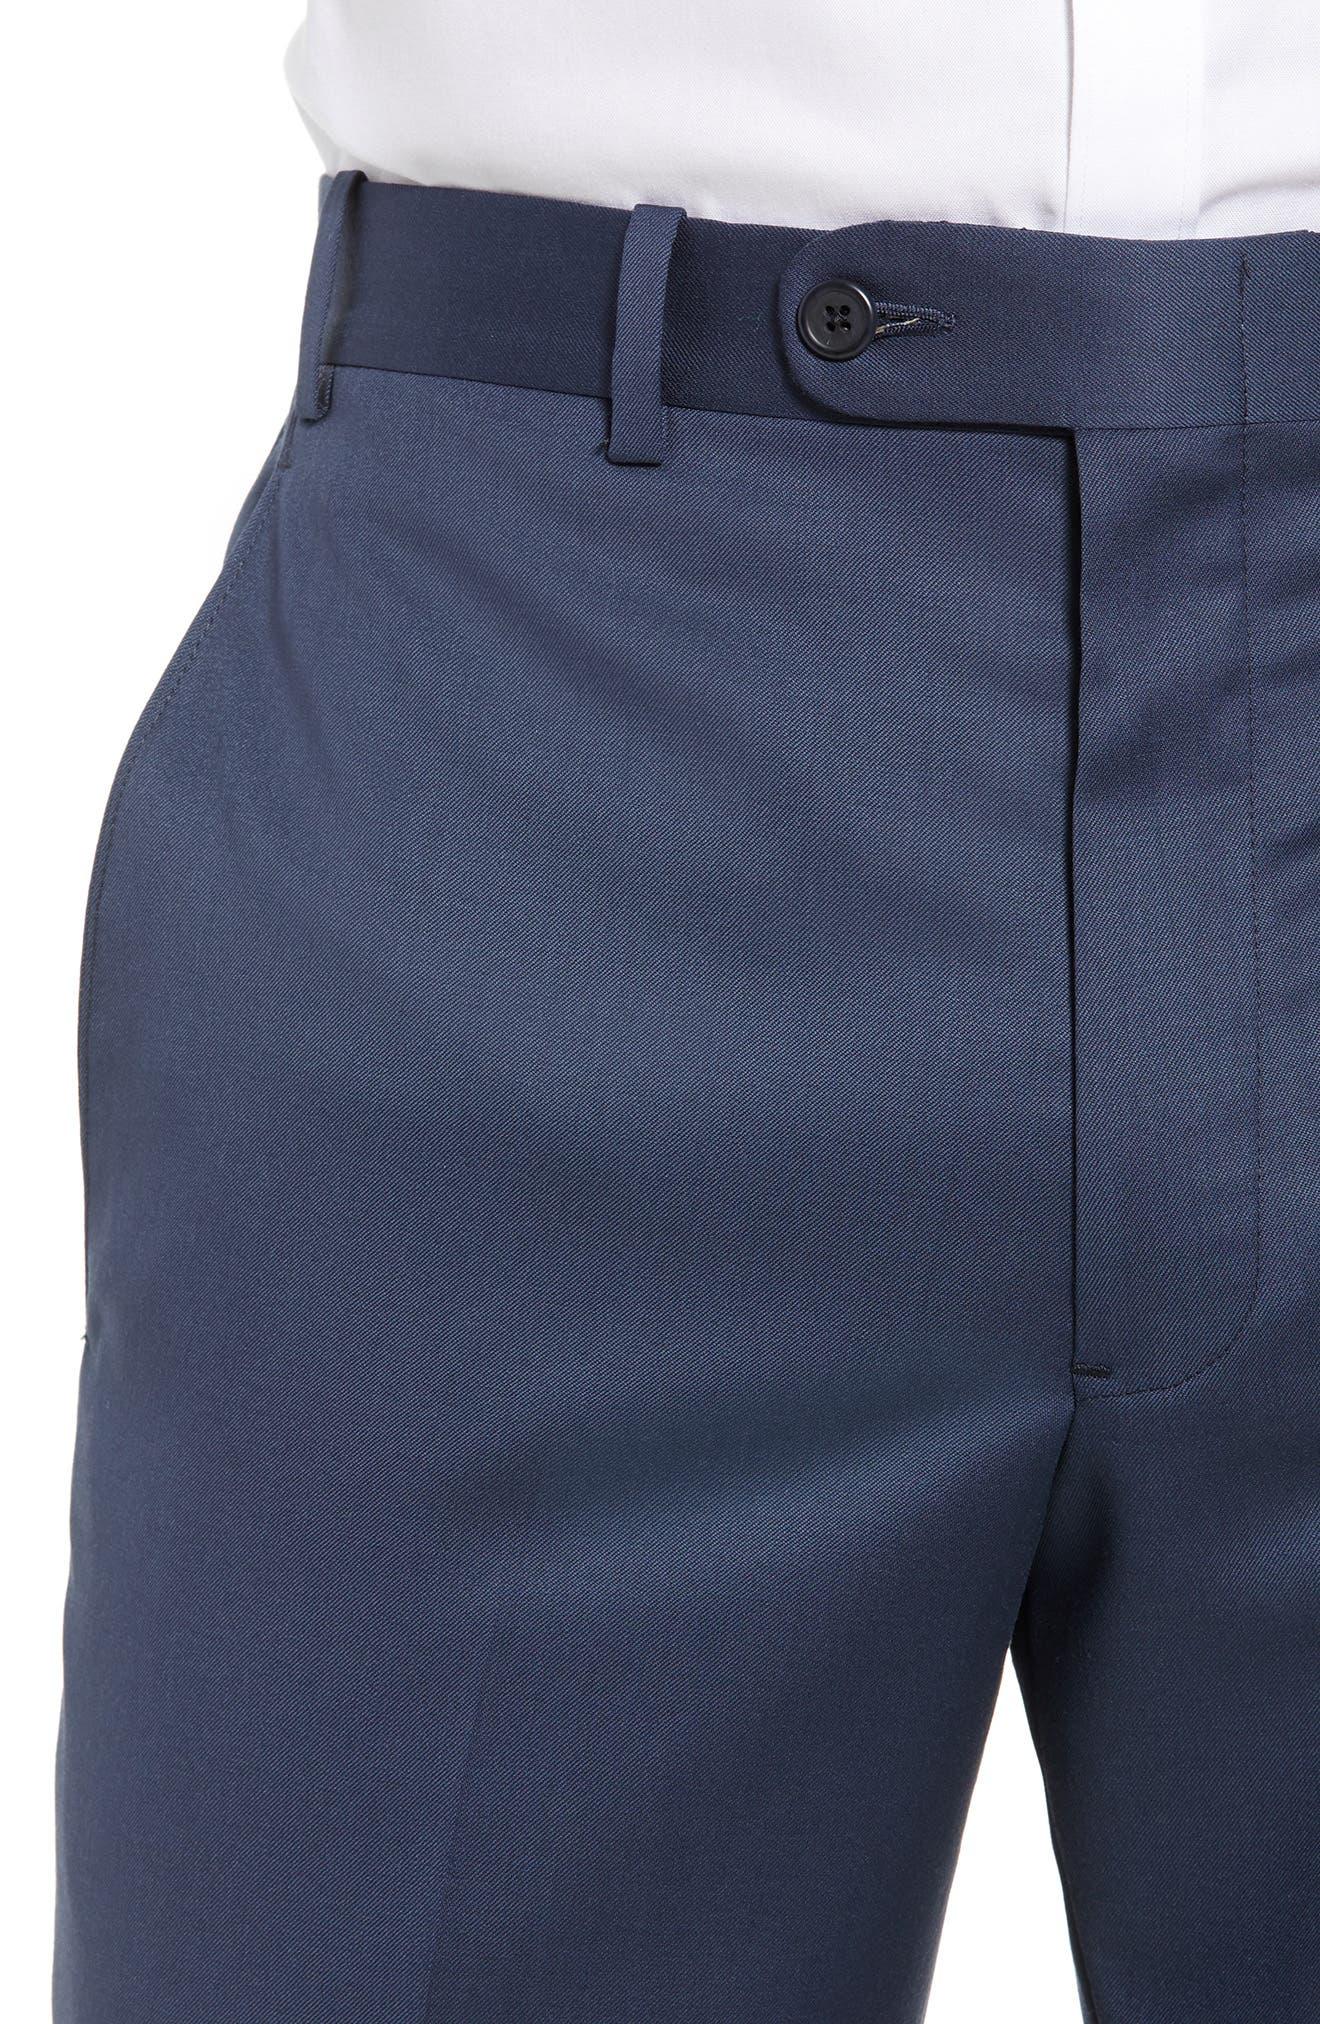 Torino Flat Front Wool Gabardine Trousers,                             Alternate thumbnail 24, color,